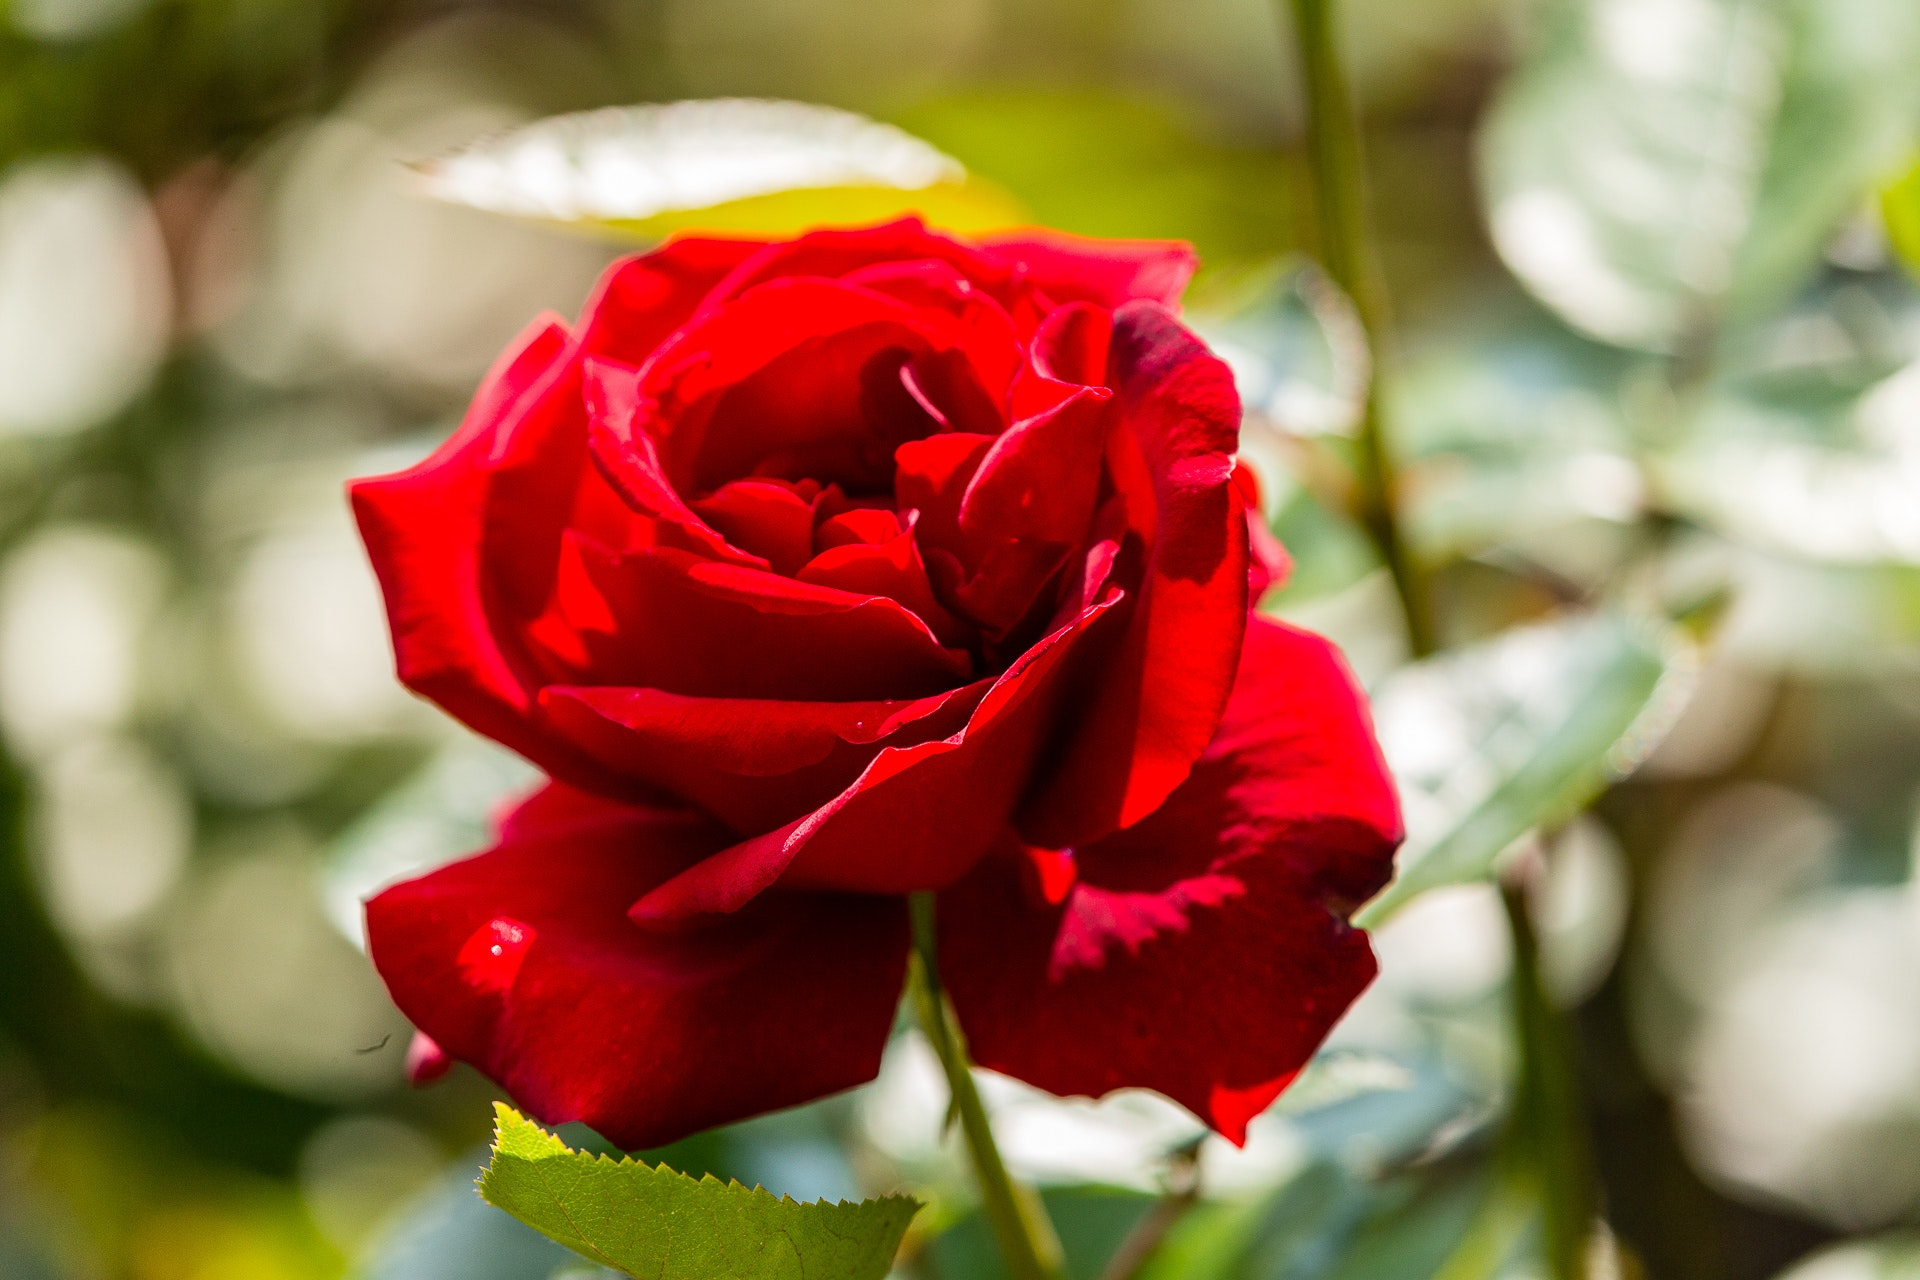 Rose Garden at Sollidens Slott